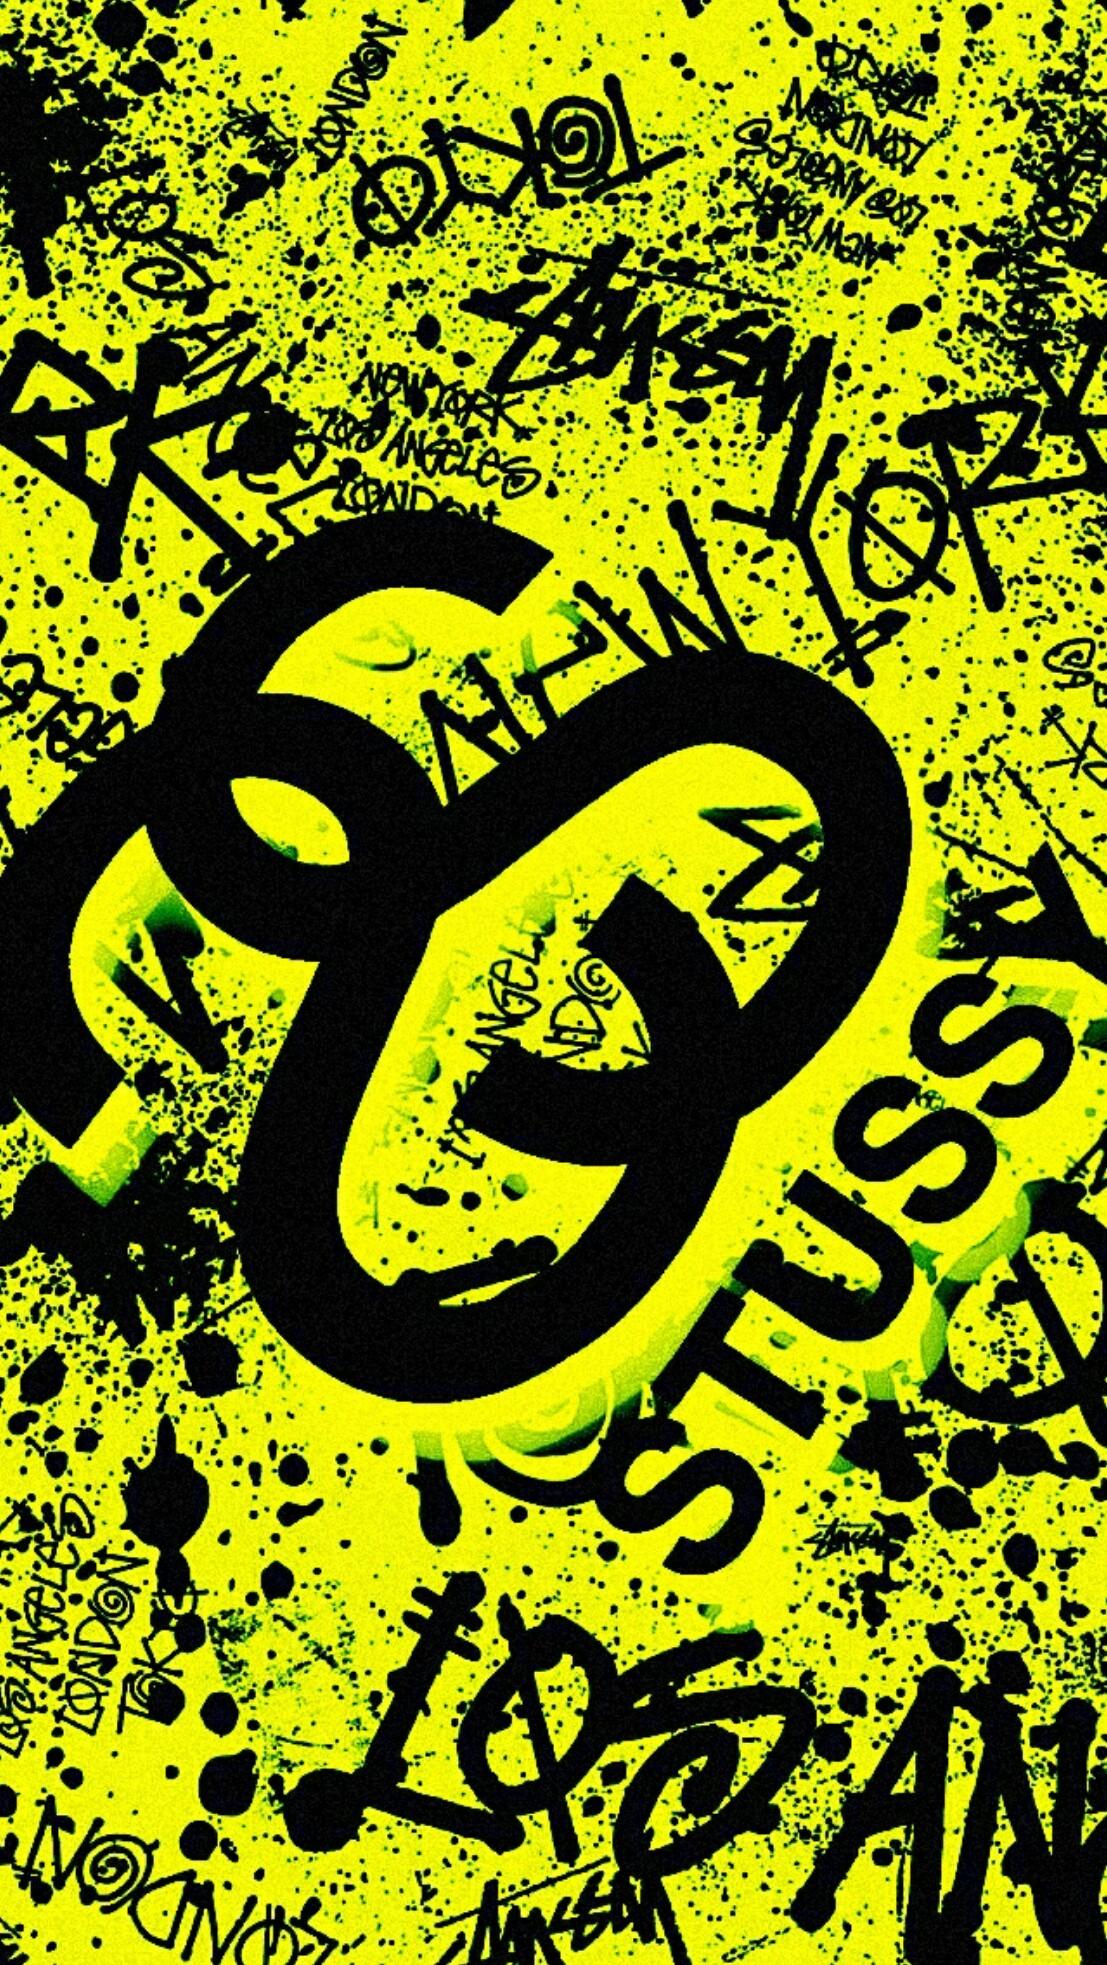 #stussy #samsung #edge #s6 #supreme #black #wallpaper #android